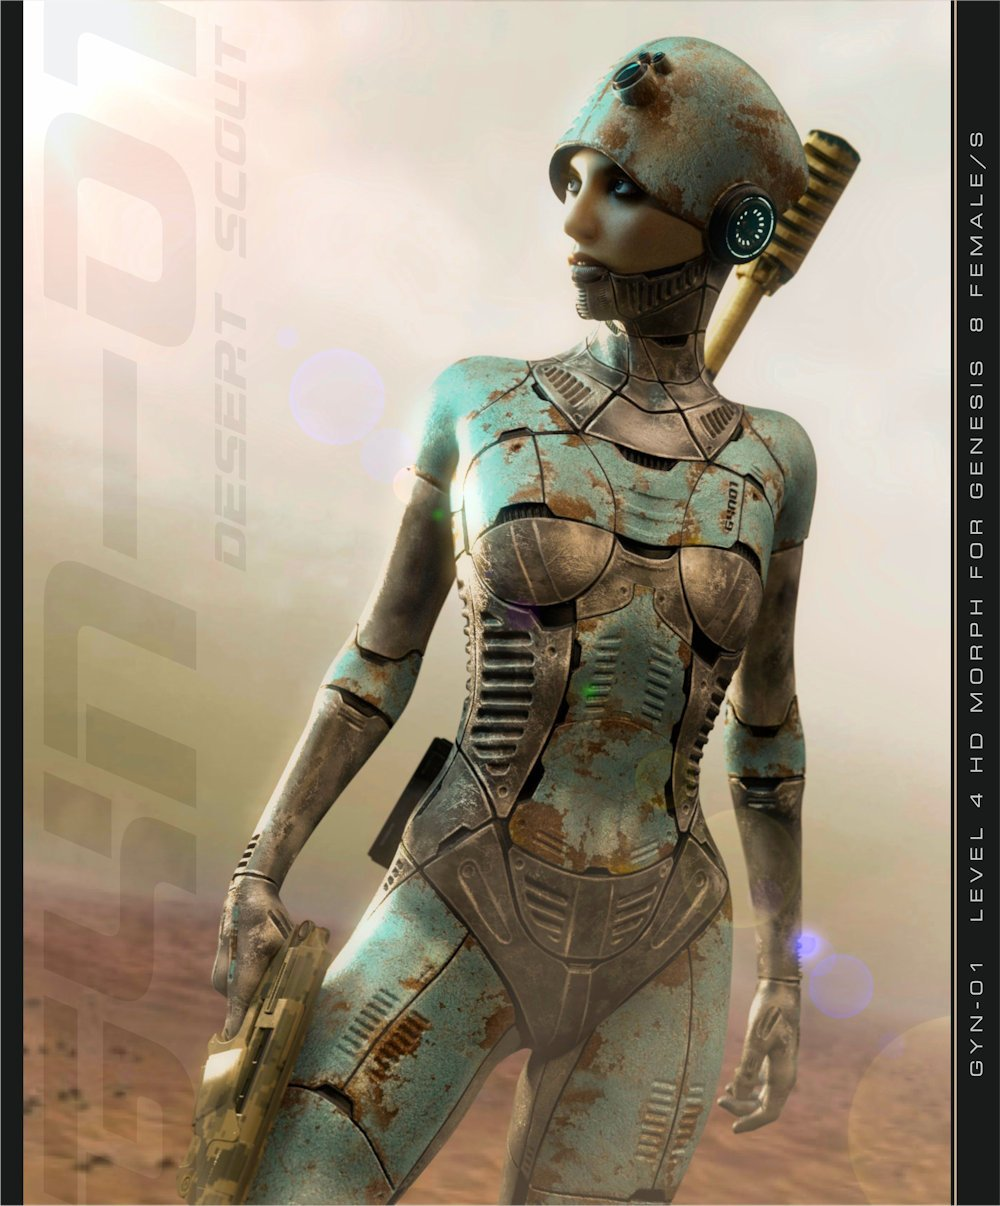 GYN-01 for Genesis 8 Female(s) by: daveyabbo, 3D Models by Daz 3D